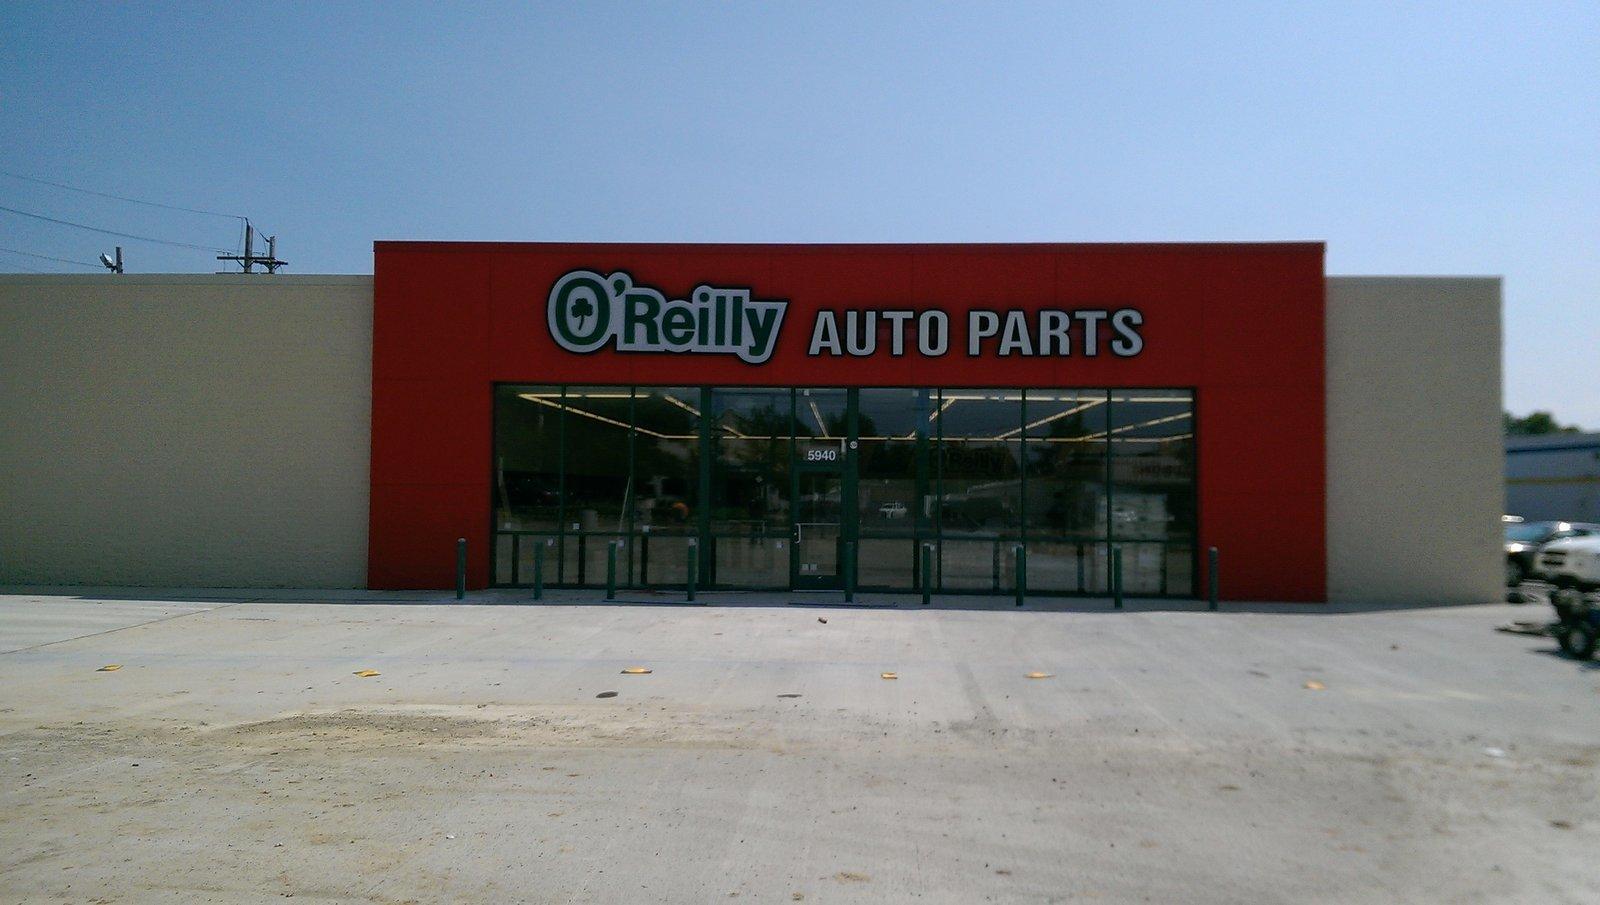 o'reilly auto parts - photo #20